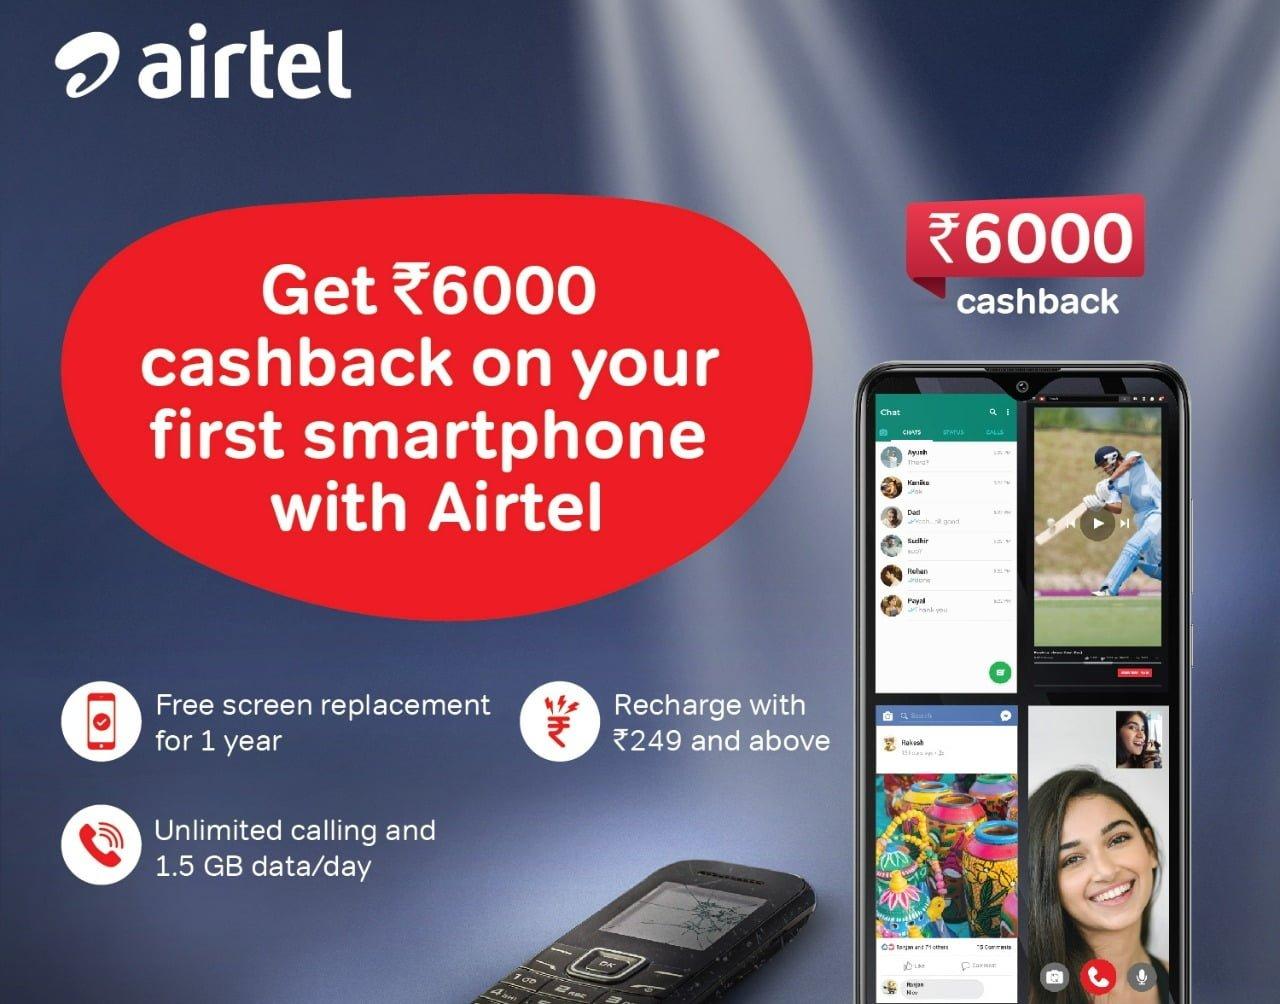 Airtel Rs 6000 cashback